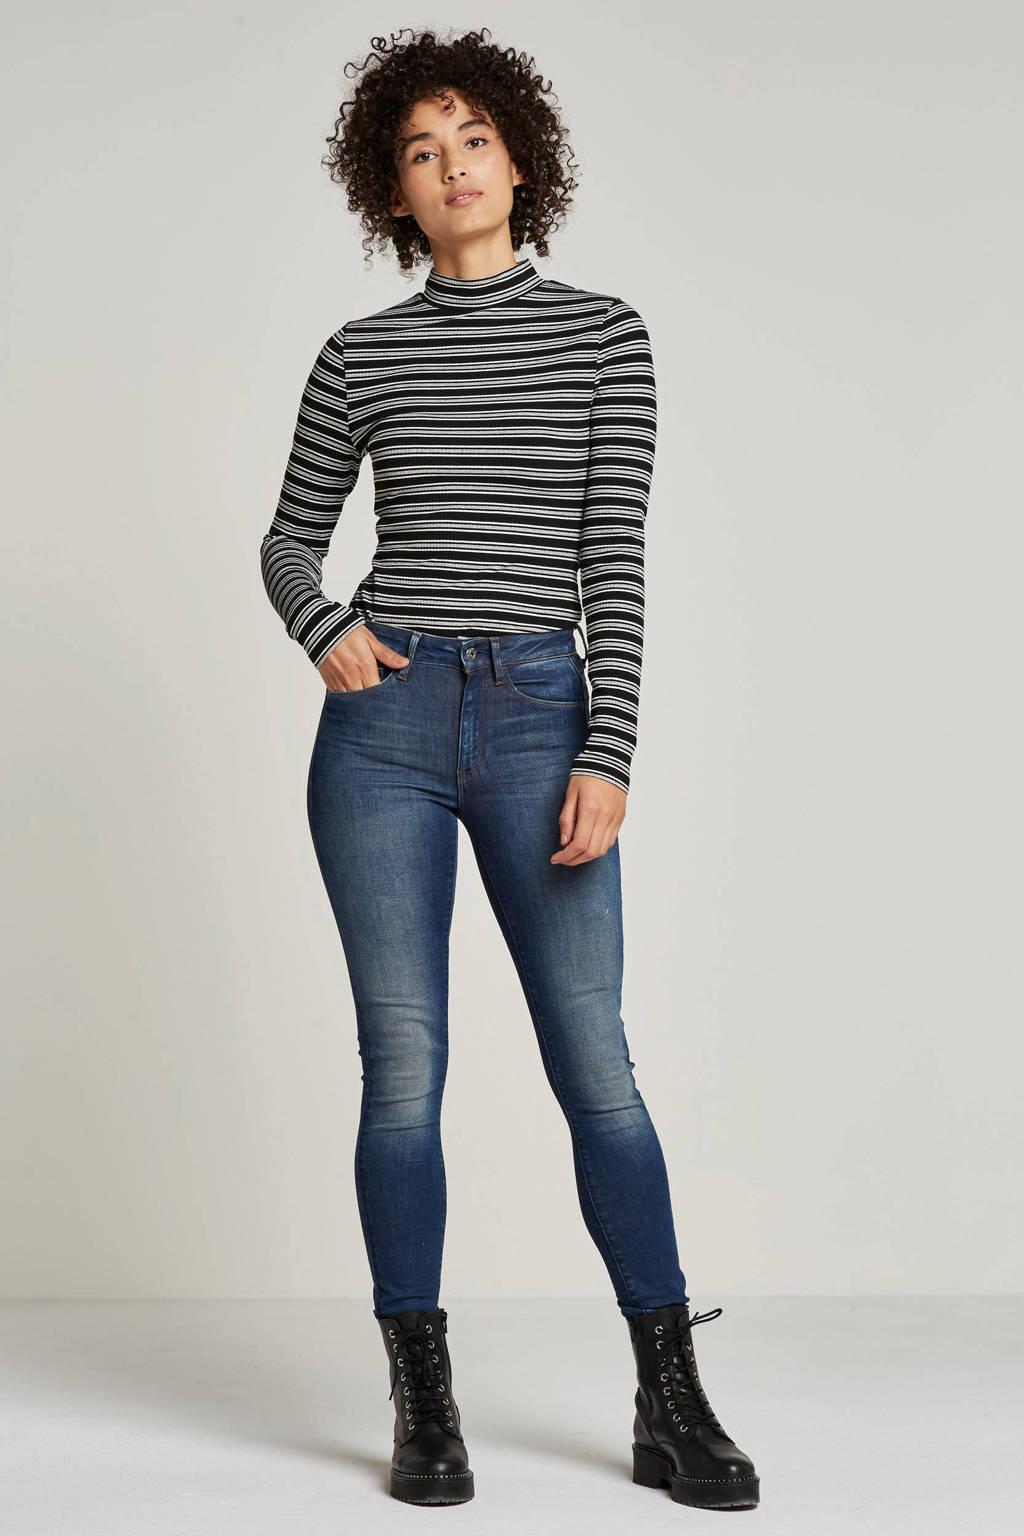 G-Star RAW 3301 high waist skinny fit jeans, Denim